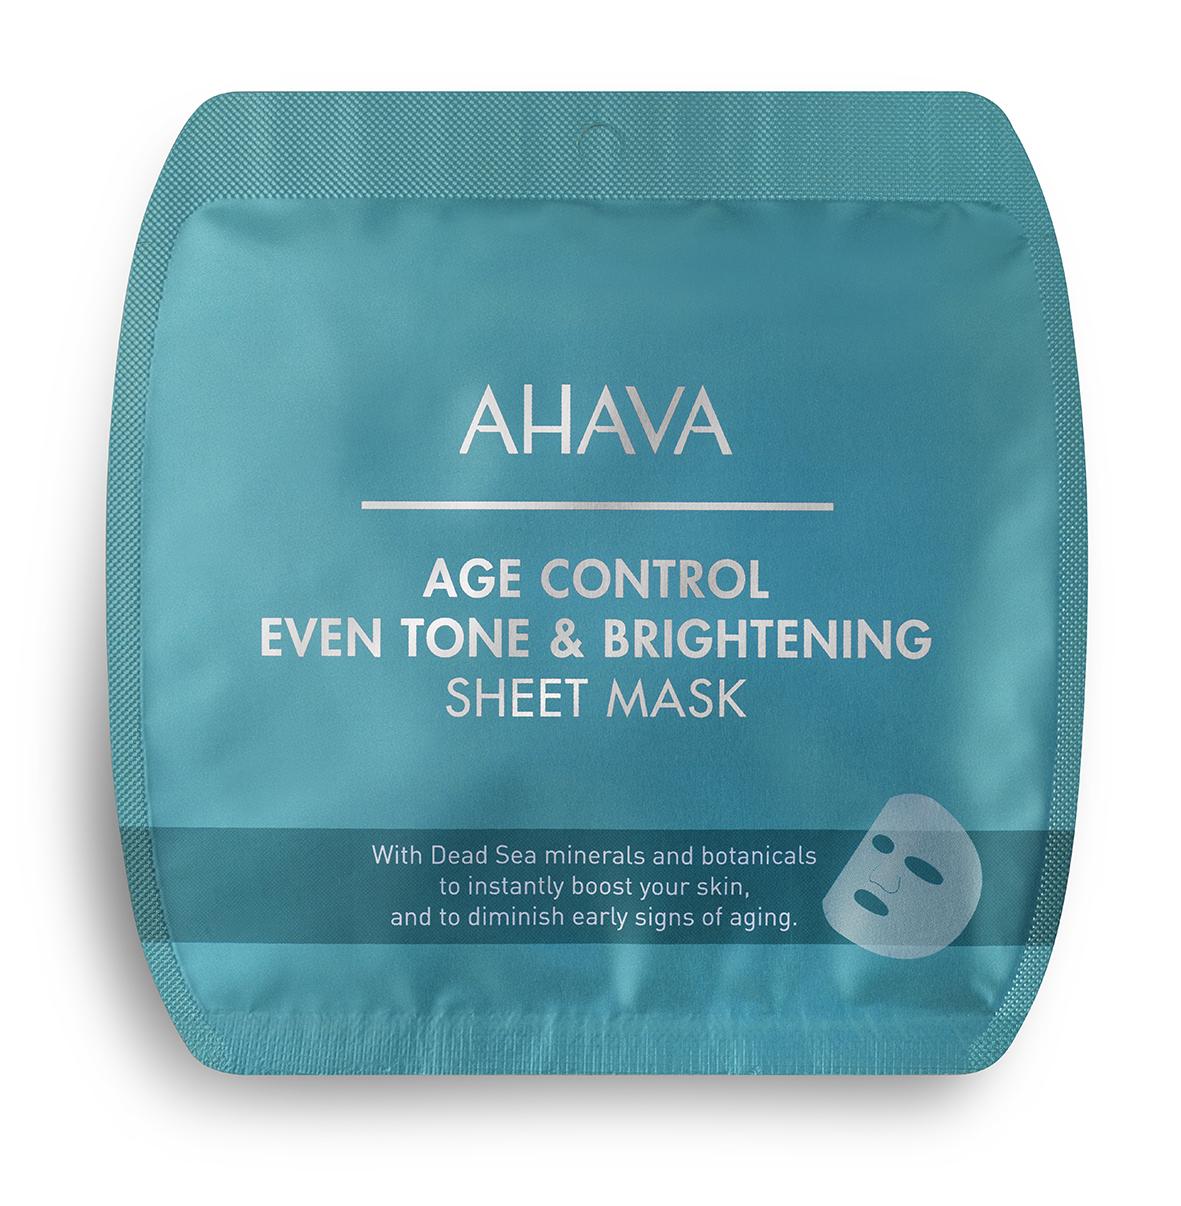 AHAVA Маска тканевая выравнивающая цвет кожи / Time To Smooth 1 шт